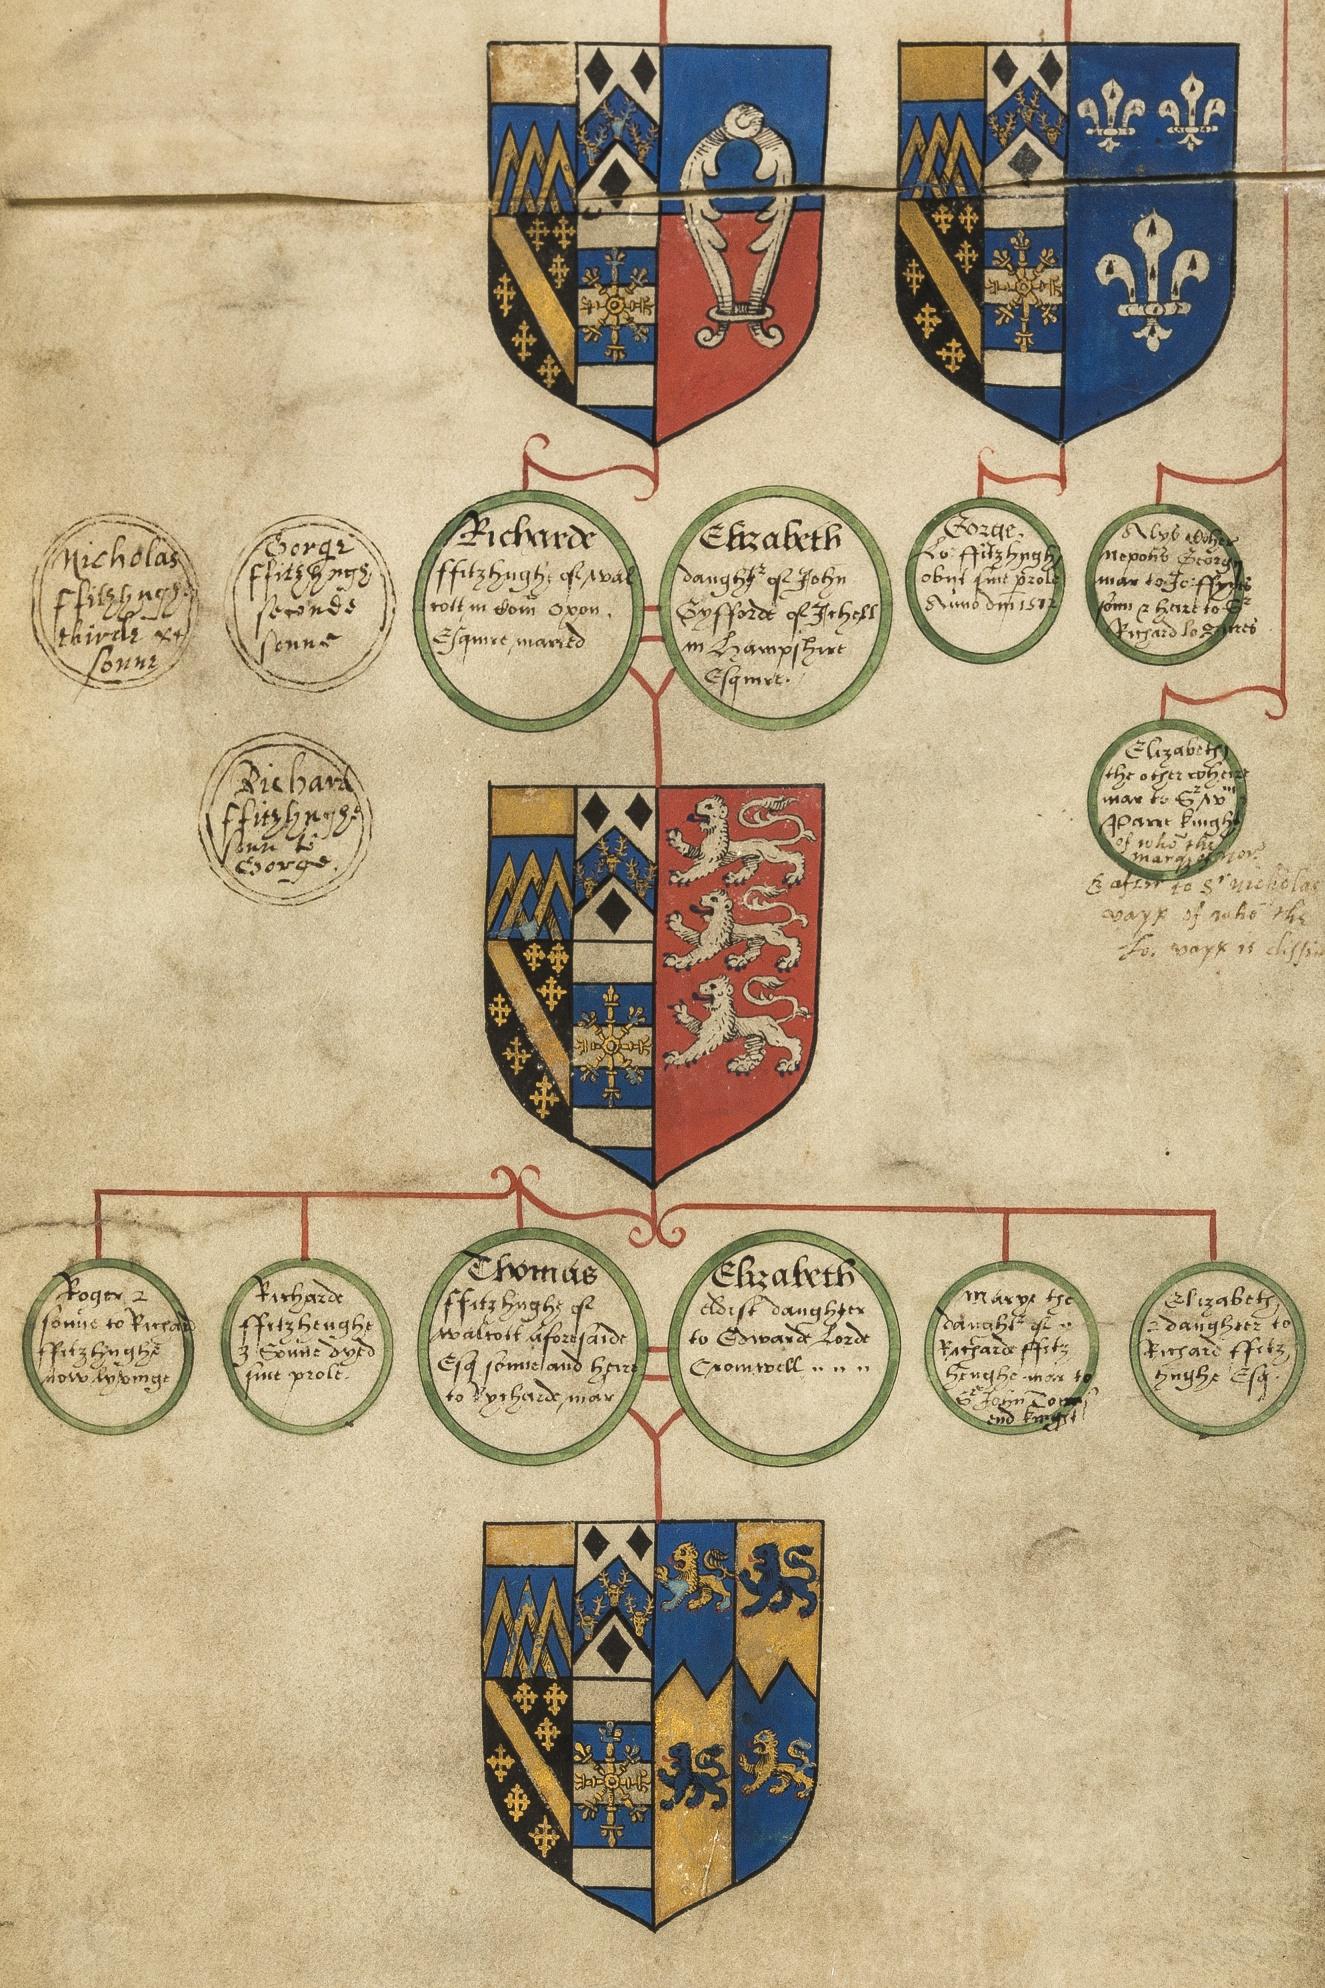 Fitzhugh Pedigree Roll, manuscript on vellum, 18 hand-painted coats of arms, [c. 1620].